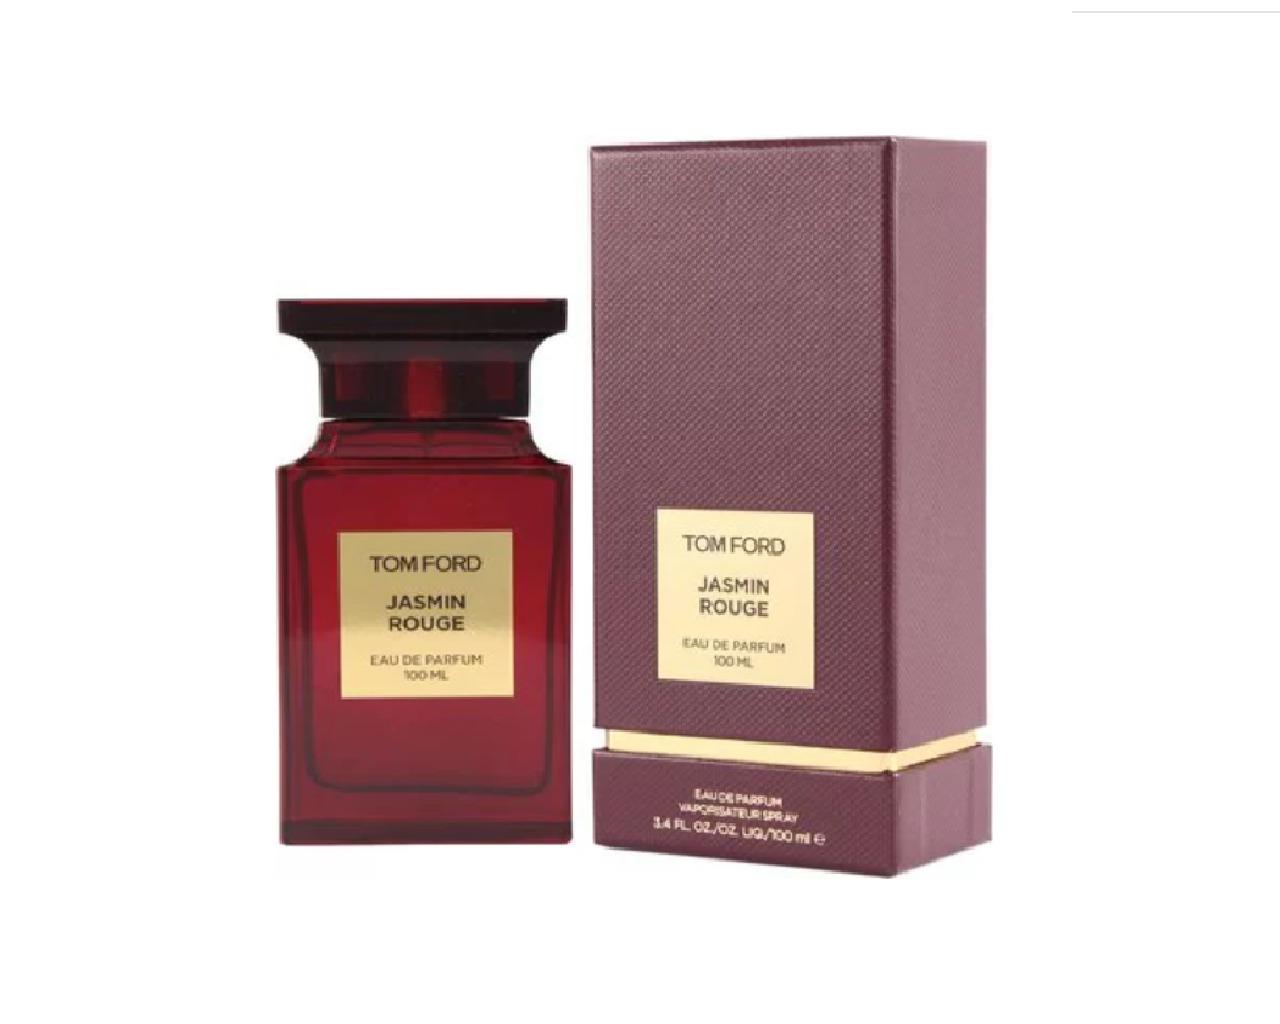 TOM FORD トムフォード ジャスミン ルージュ オードパルファム 100ml jasmin rouge Eau De Parfum